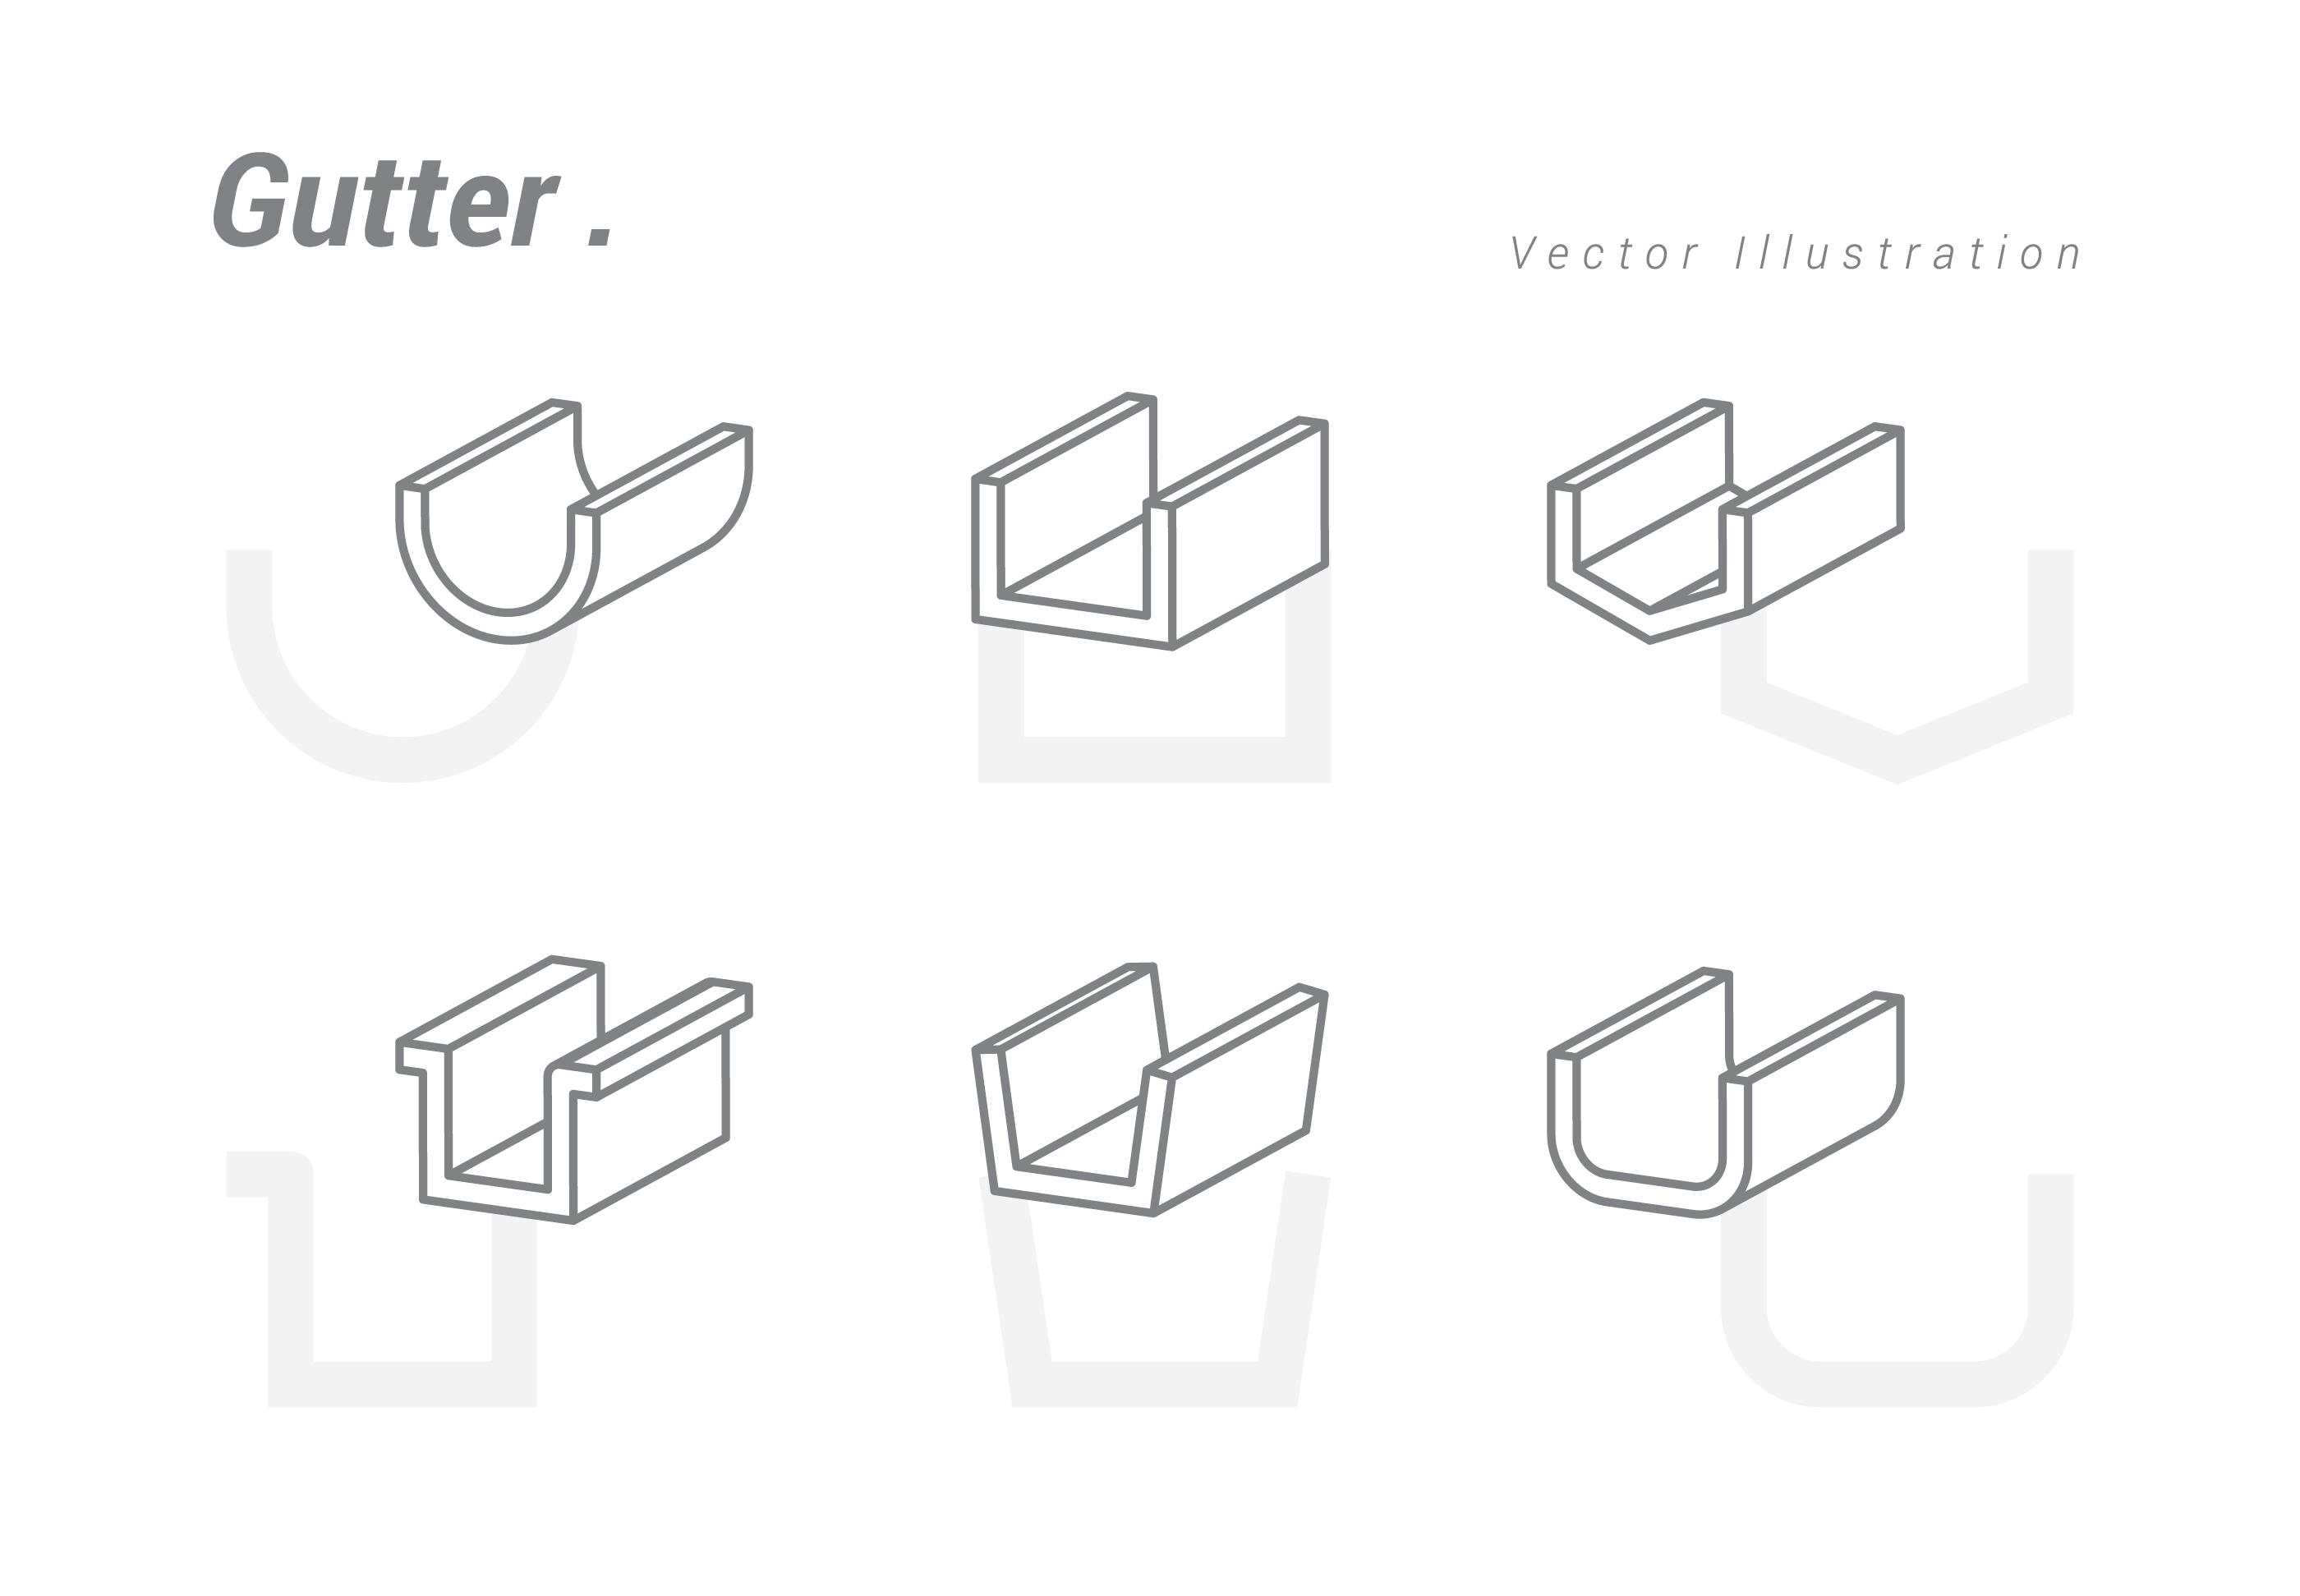 Gutter Vector Illustration Download Free Vectors